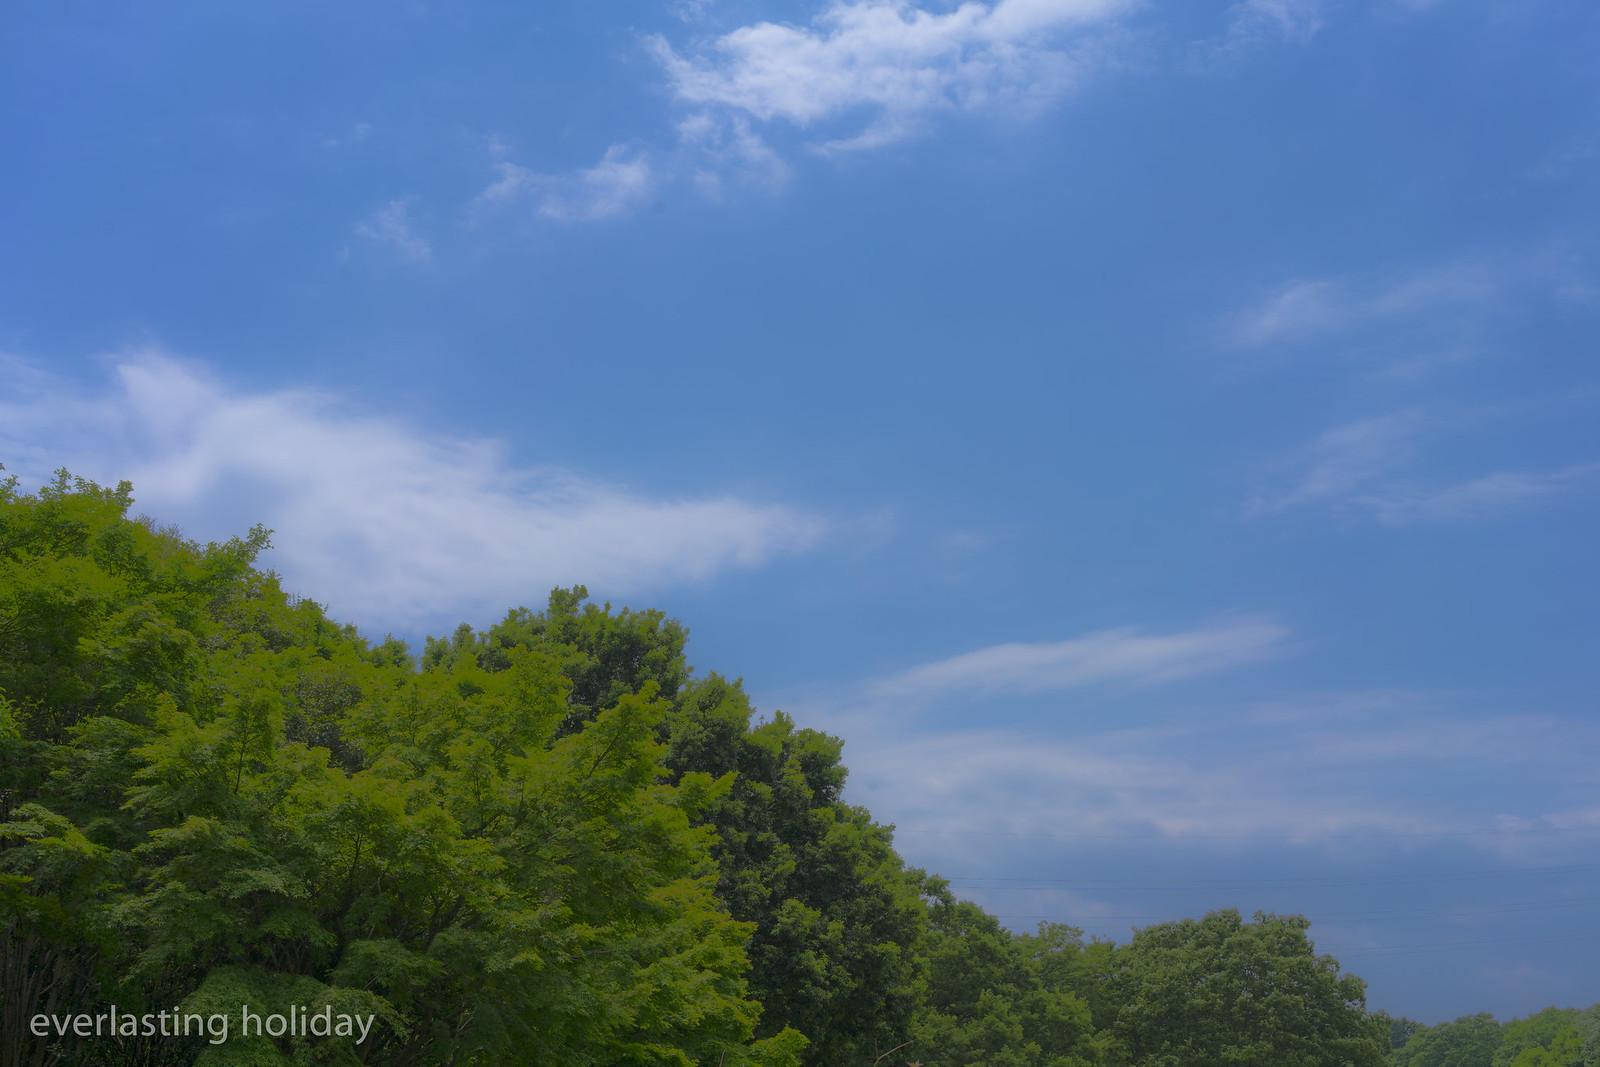 小金井公園 Koganei Park-0023